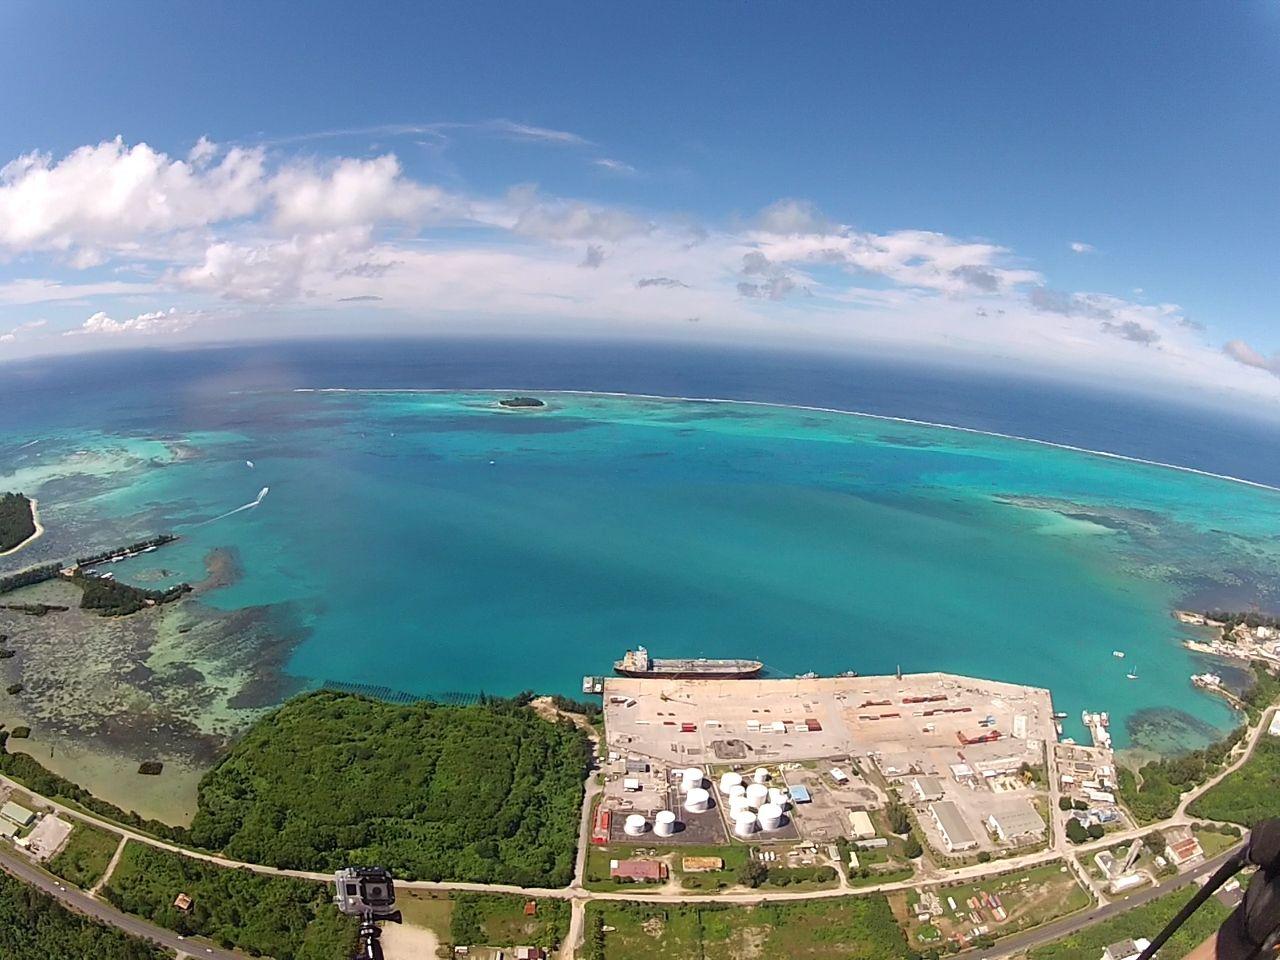 Saipan harbor